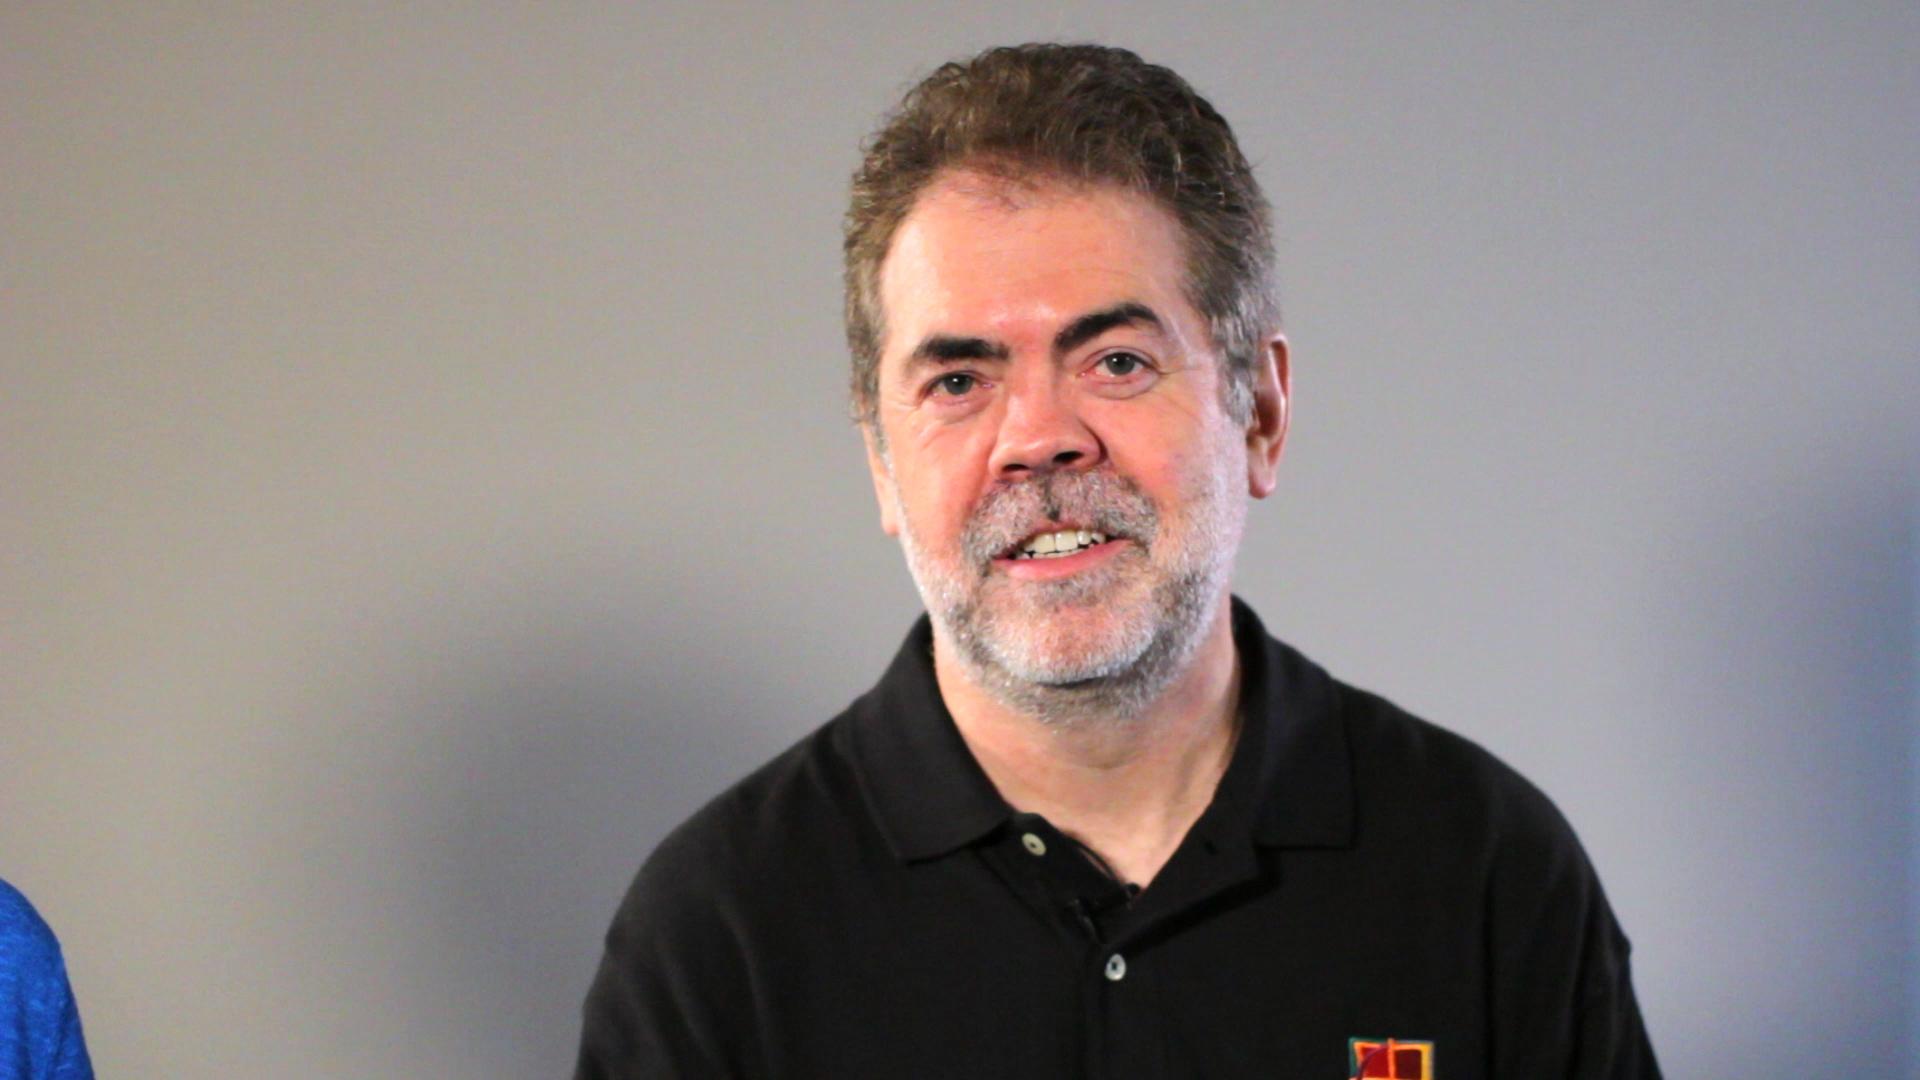 C.J. Graphics CEO Saw Phenomenal Innovation at drupa 2016